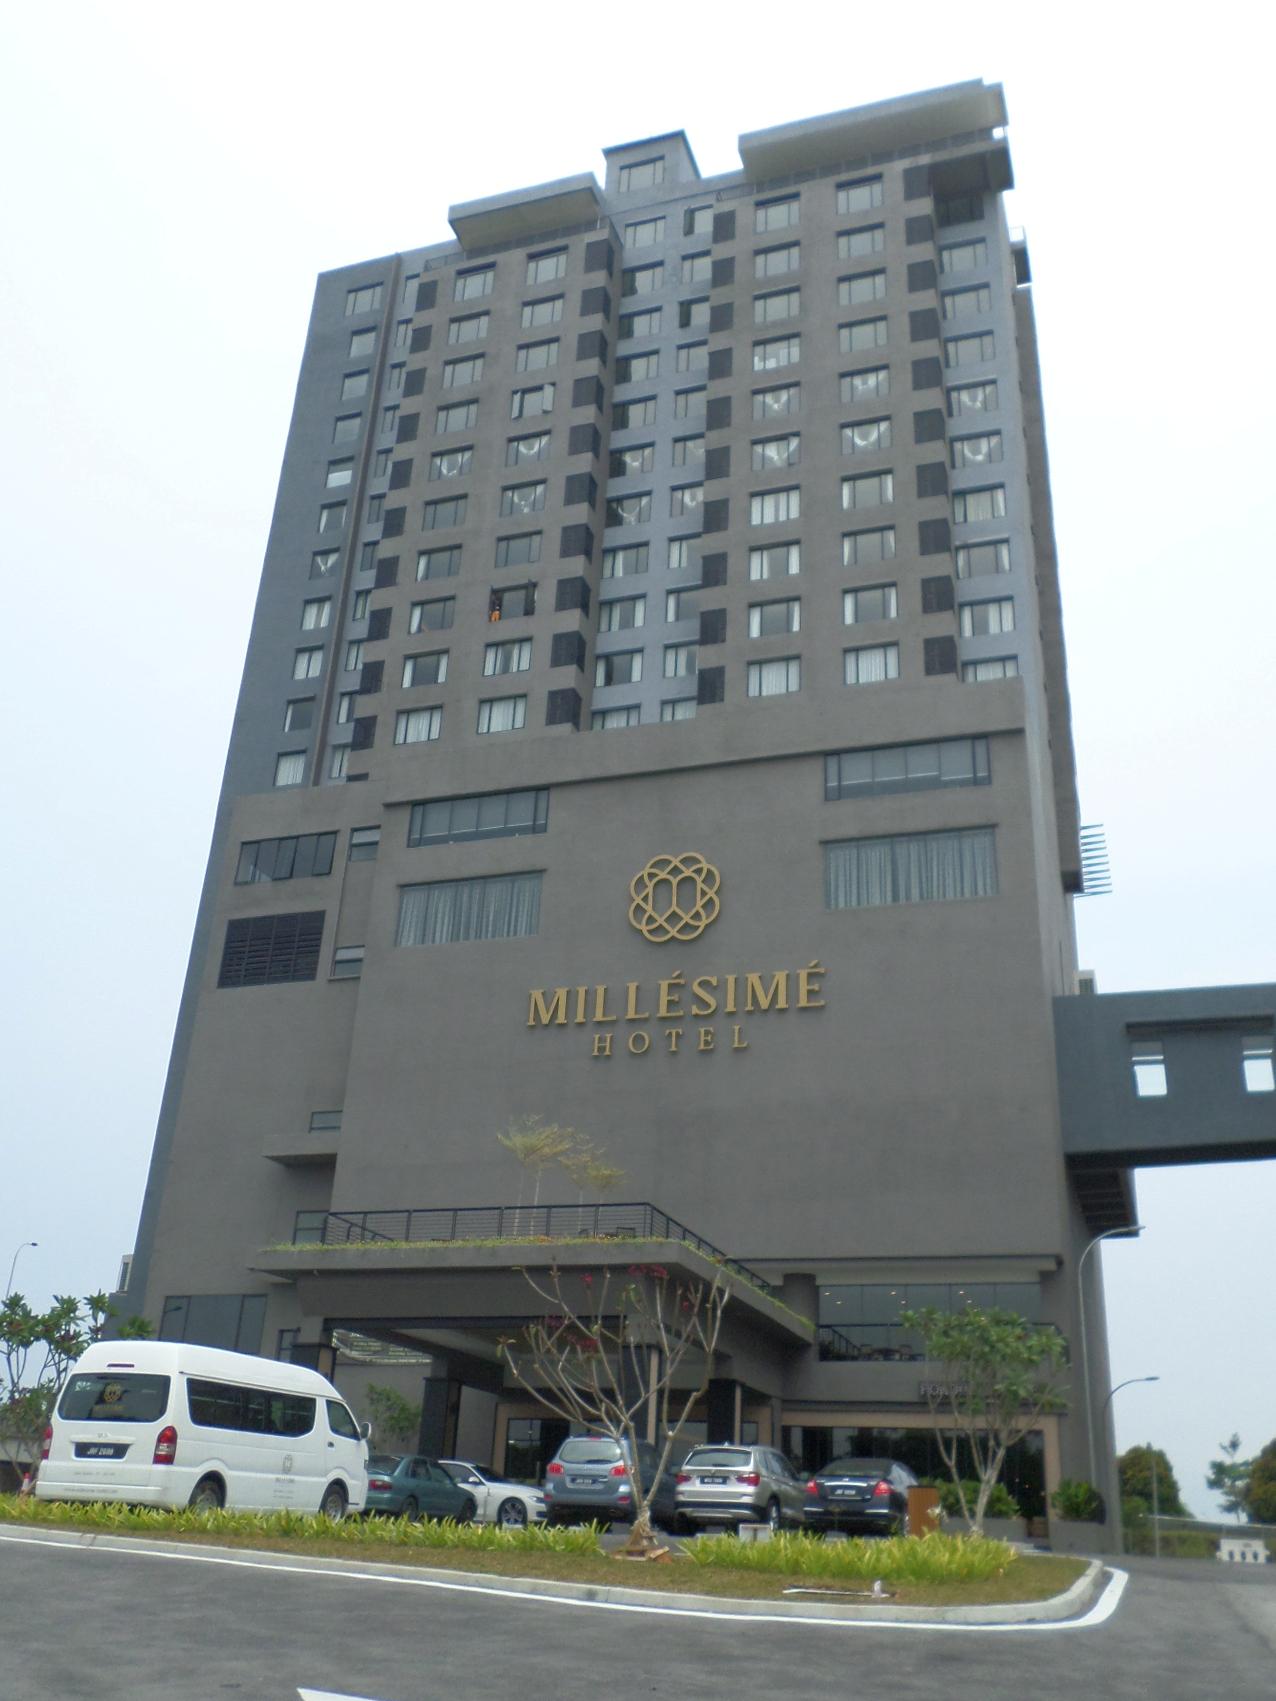 Millesimes hotels